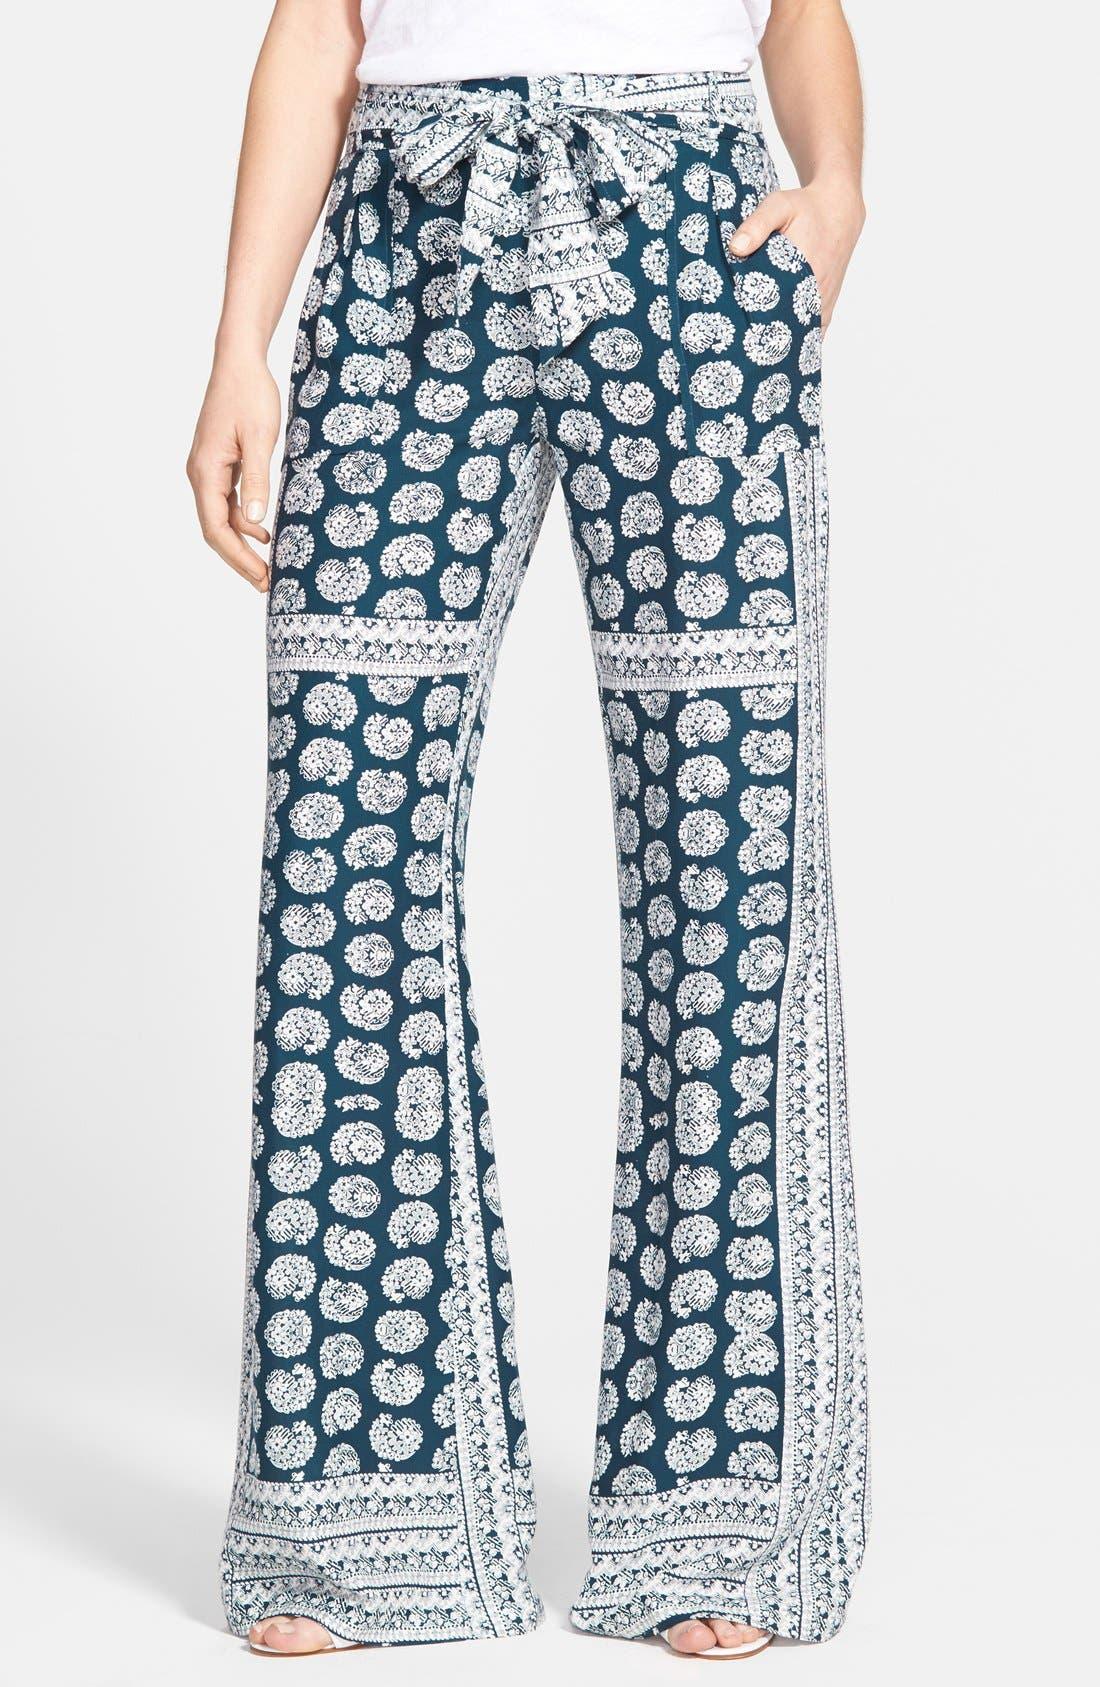 JESSICA SIMPSON, 'Kingston' Soft Woven Pants, Main thumbnail 1, color, 410